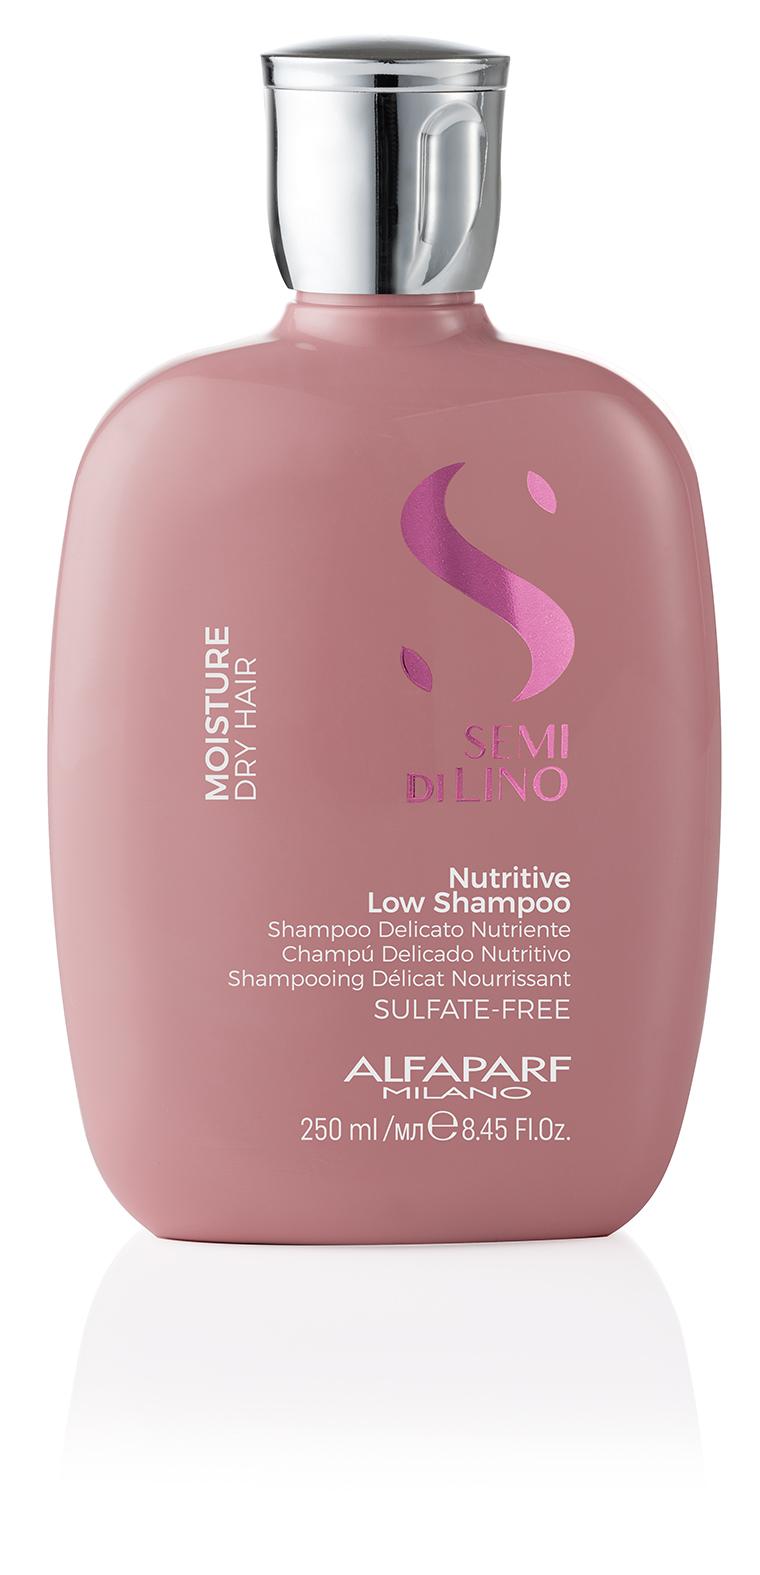 NUTRITIVE LOW SHAMPOO    DESCRIPTION   Gently cleanses Nourishes  SULFATE FREE LIGHTNESS    FORMAT   Bottle 250ml